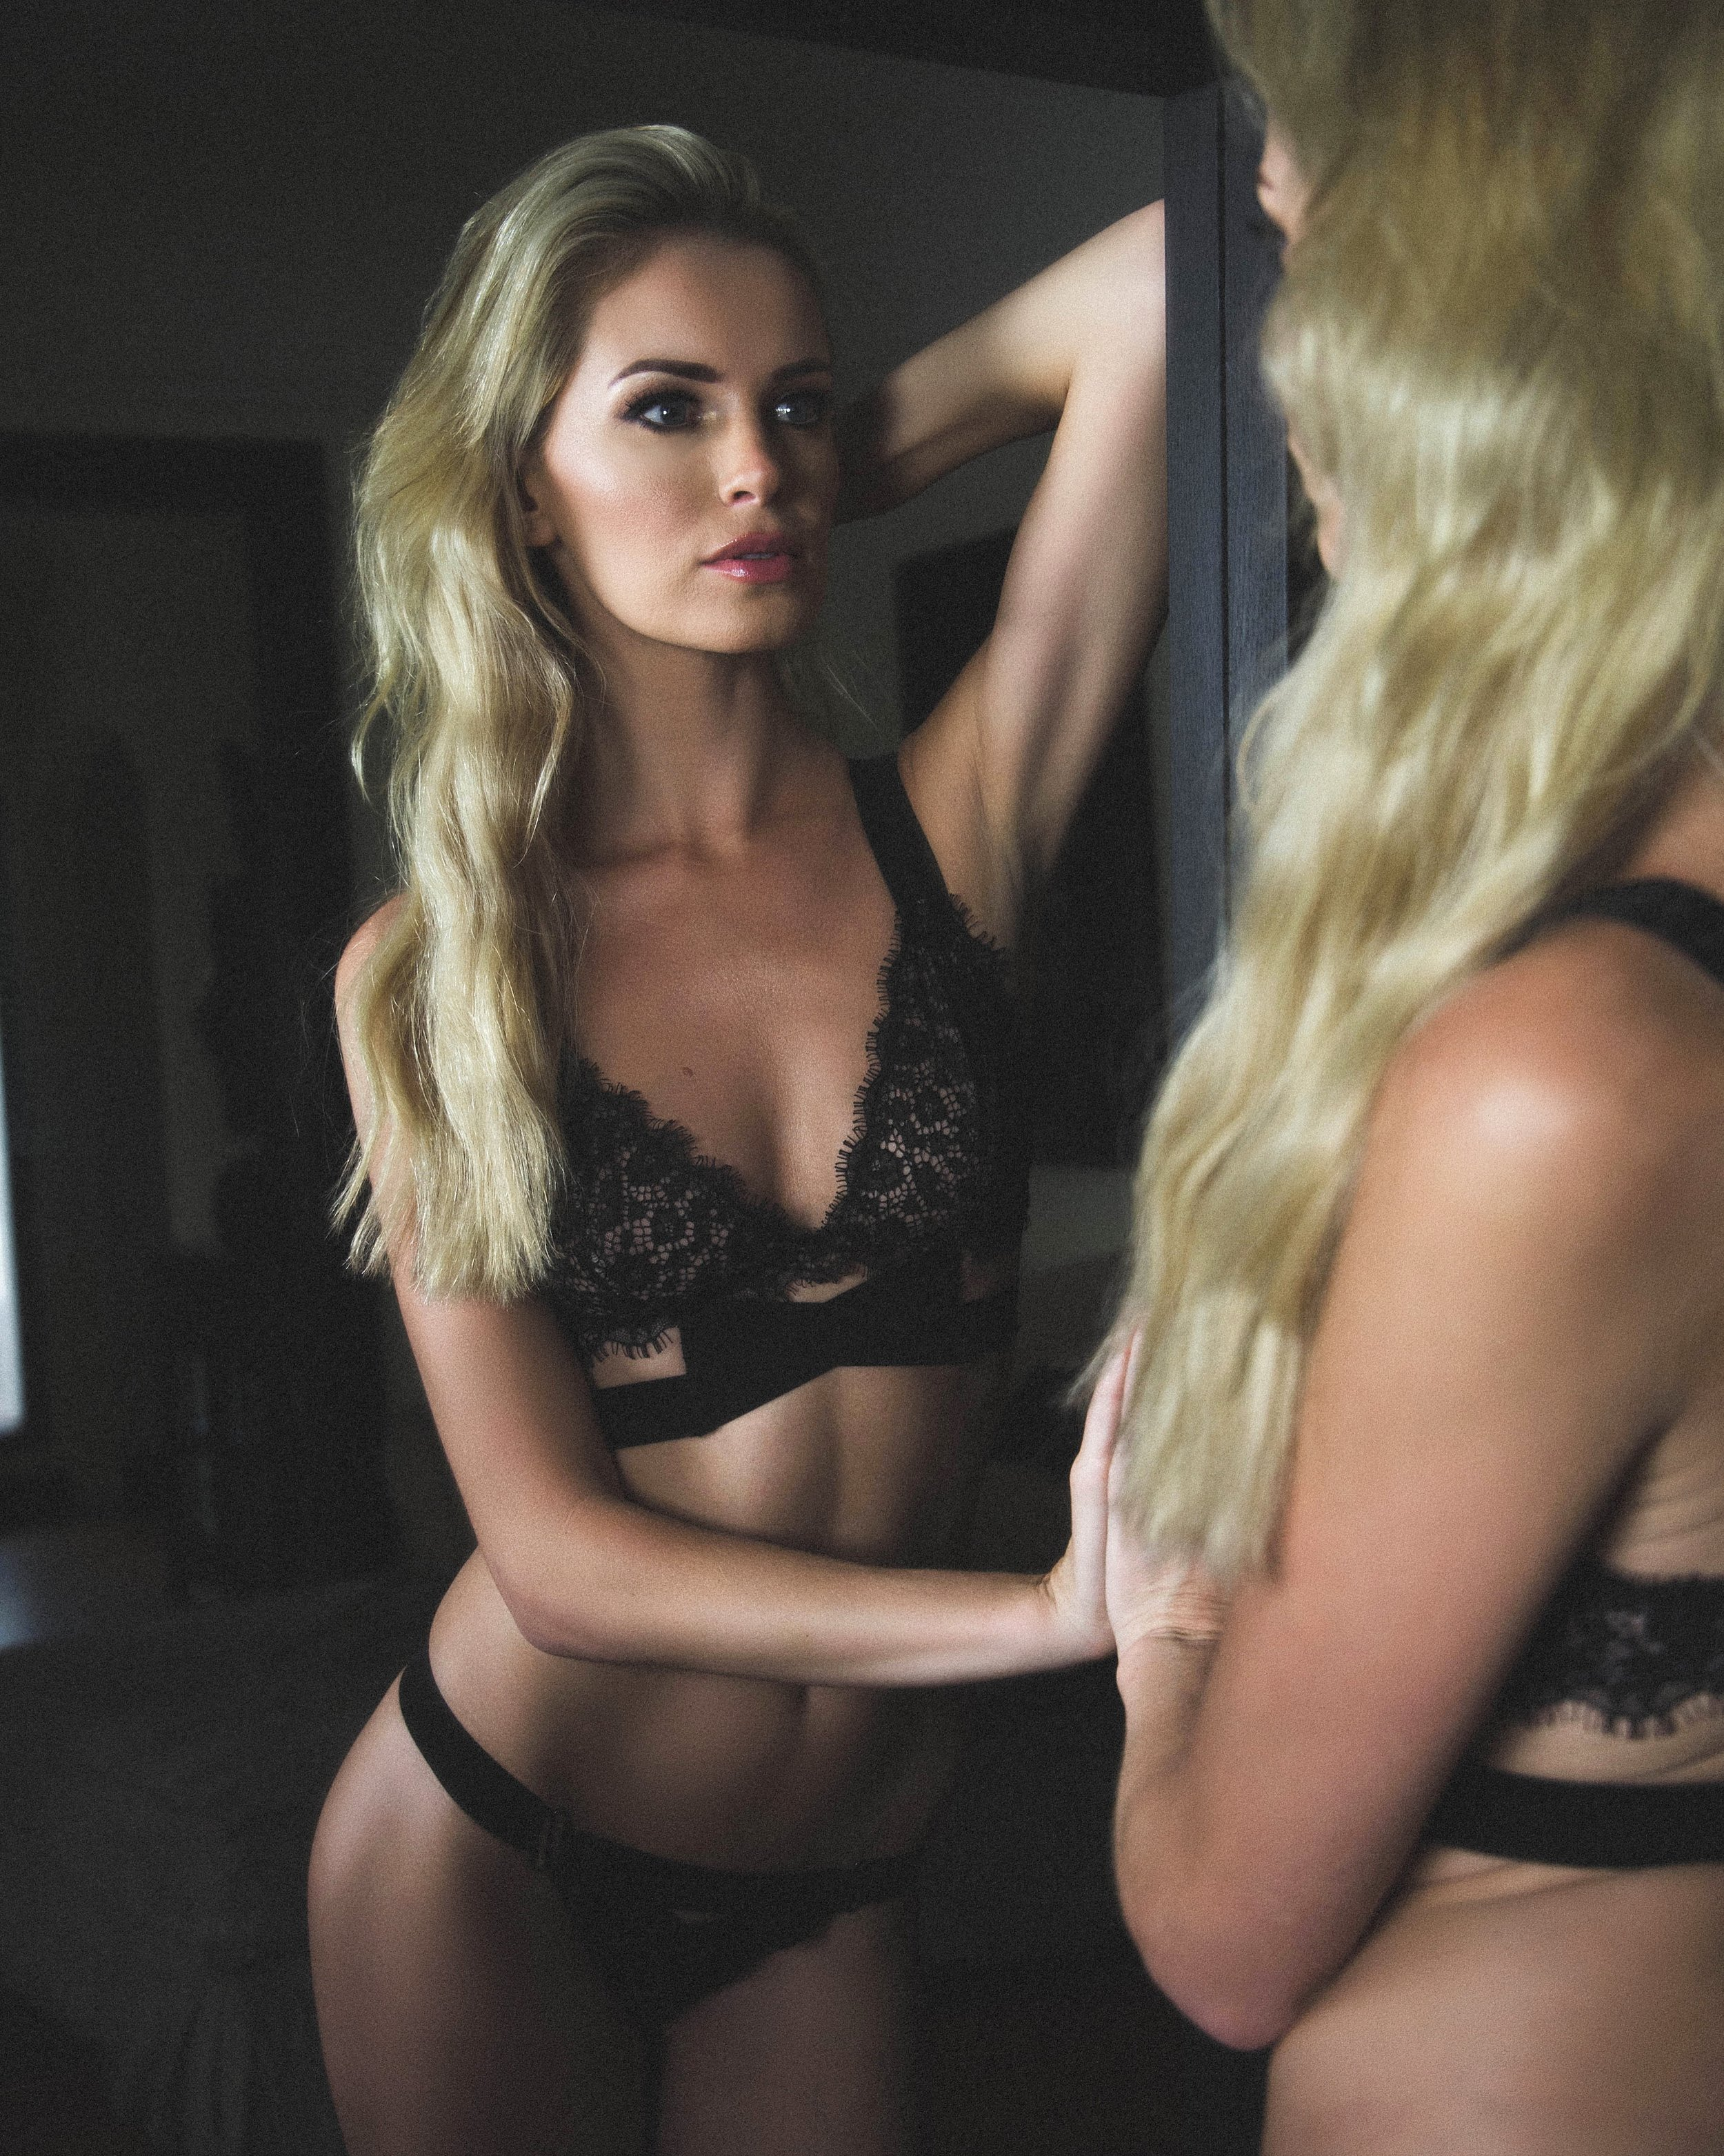 One Model Mission's Katy Johnson